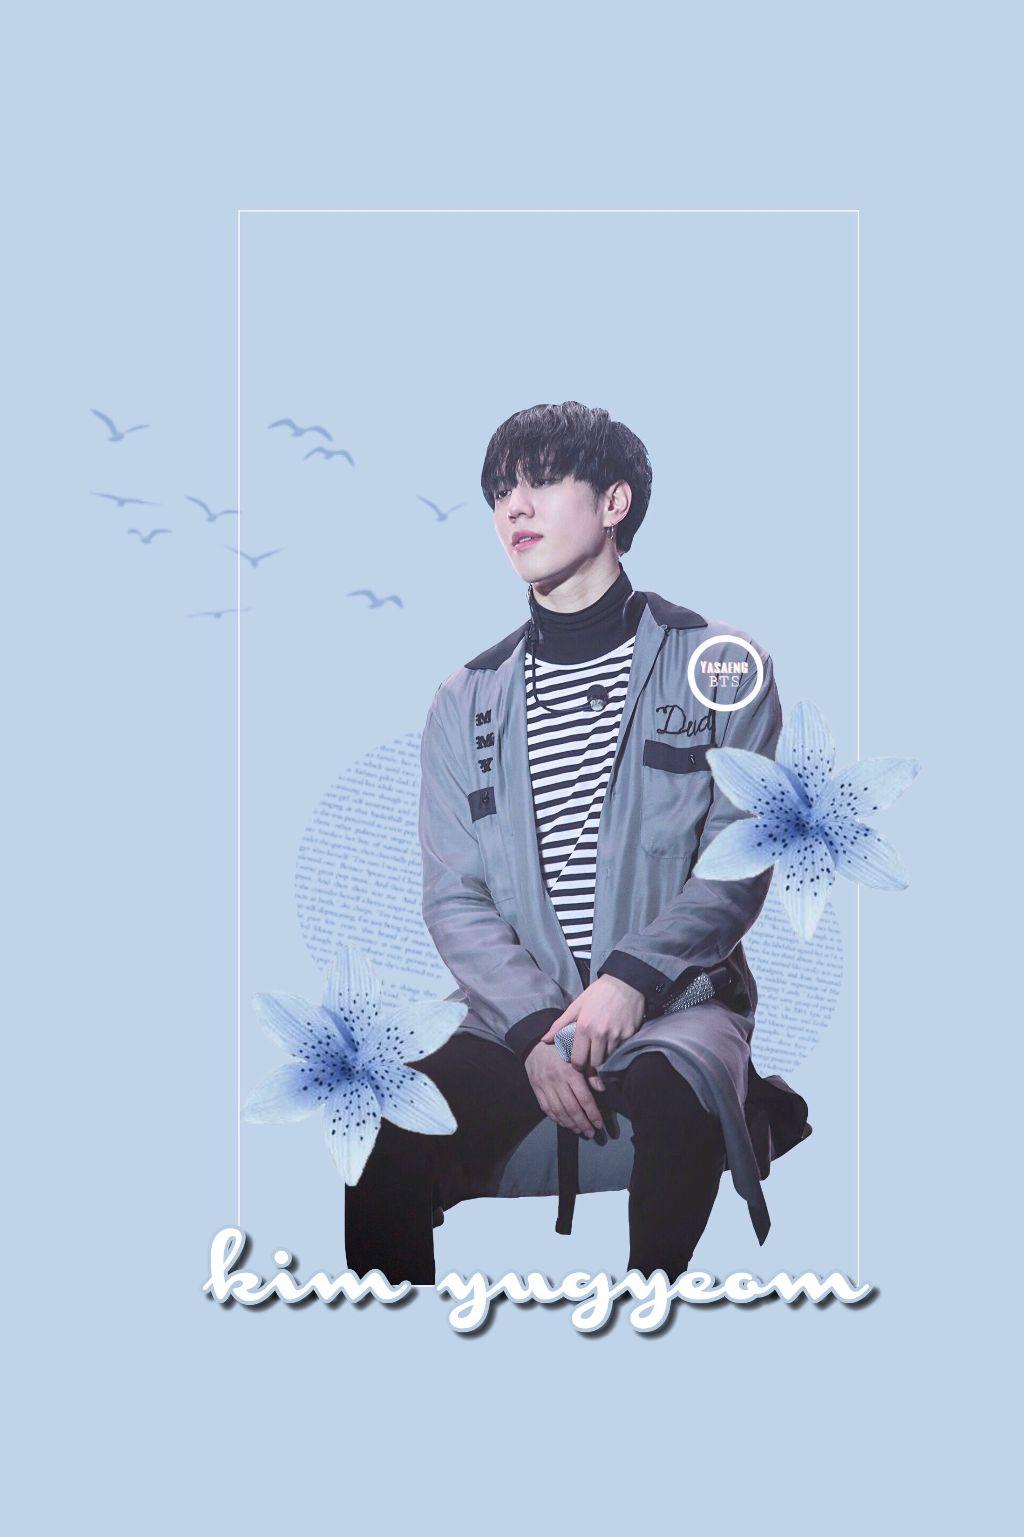 "≻ ""don't worry about tomorrow       today, i'll hard carry only for you""     ⌜✨⌟ request open     ⌜♚⌟ yugyeom sticker @/jin-hope ⌜♔⌟ writing sticker @/javierakinomoto ⌜♚⌟ bird sticker @/apenas_r ⌜♔⌟ blue flower sticker @/irmapiggelin                                                  ↜↨↝   #got7 #got7yugyeom #kimyugyeom #yugyeom #kpop #kpopedit"